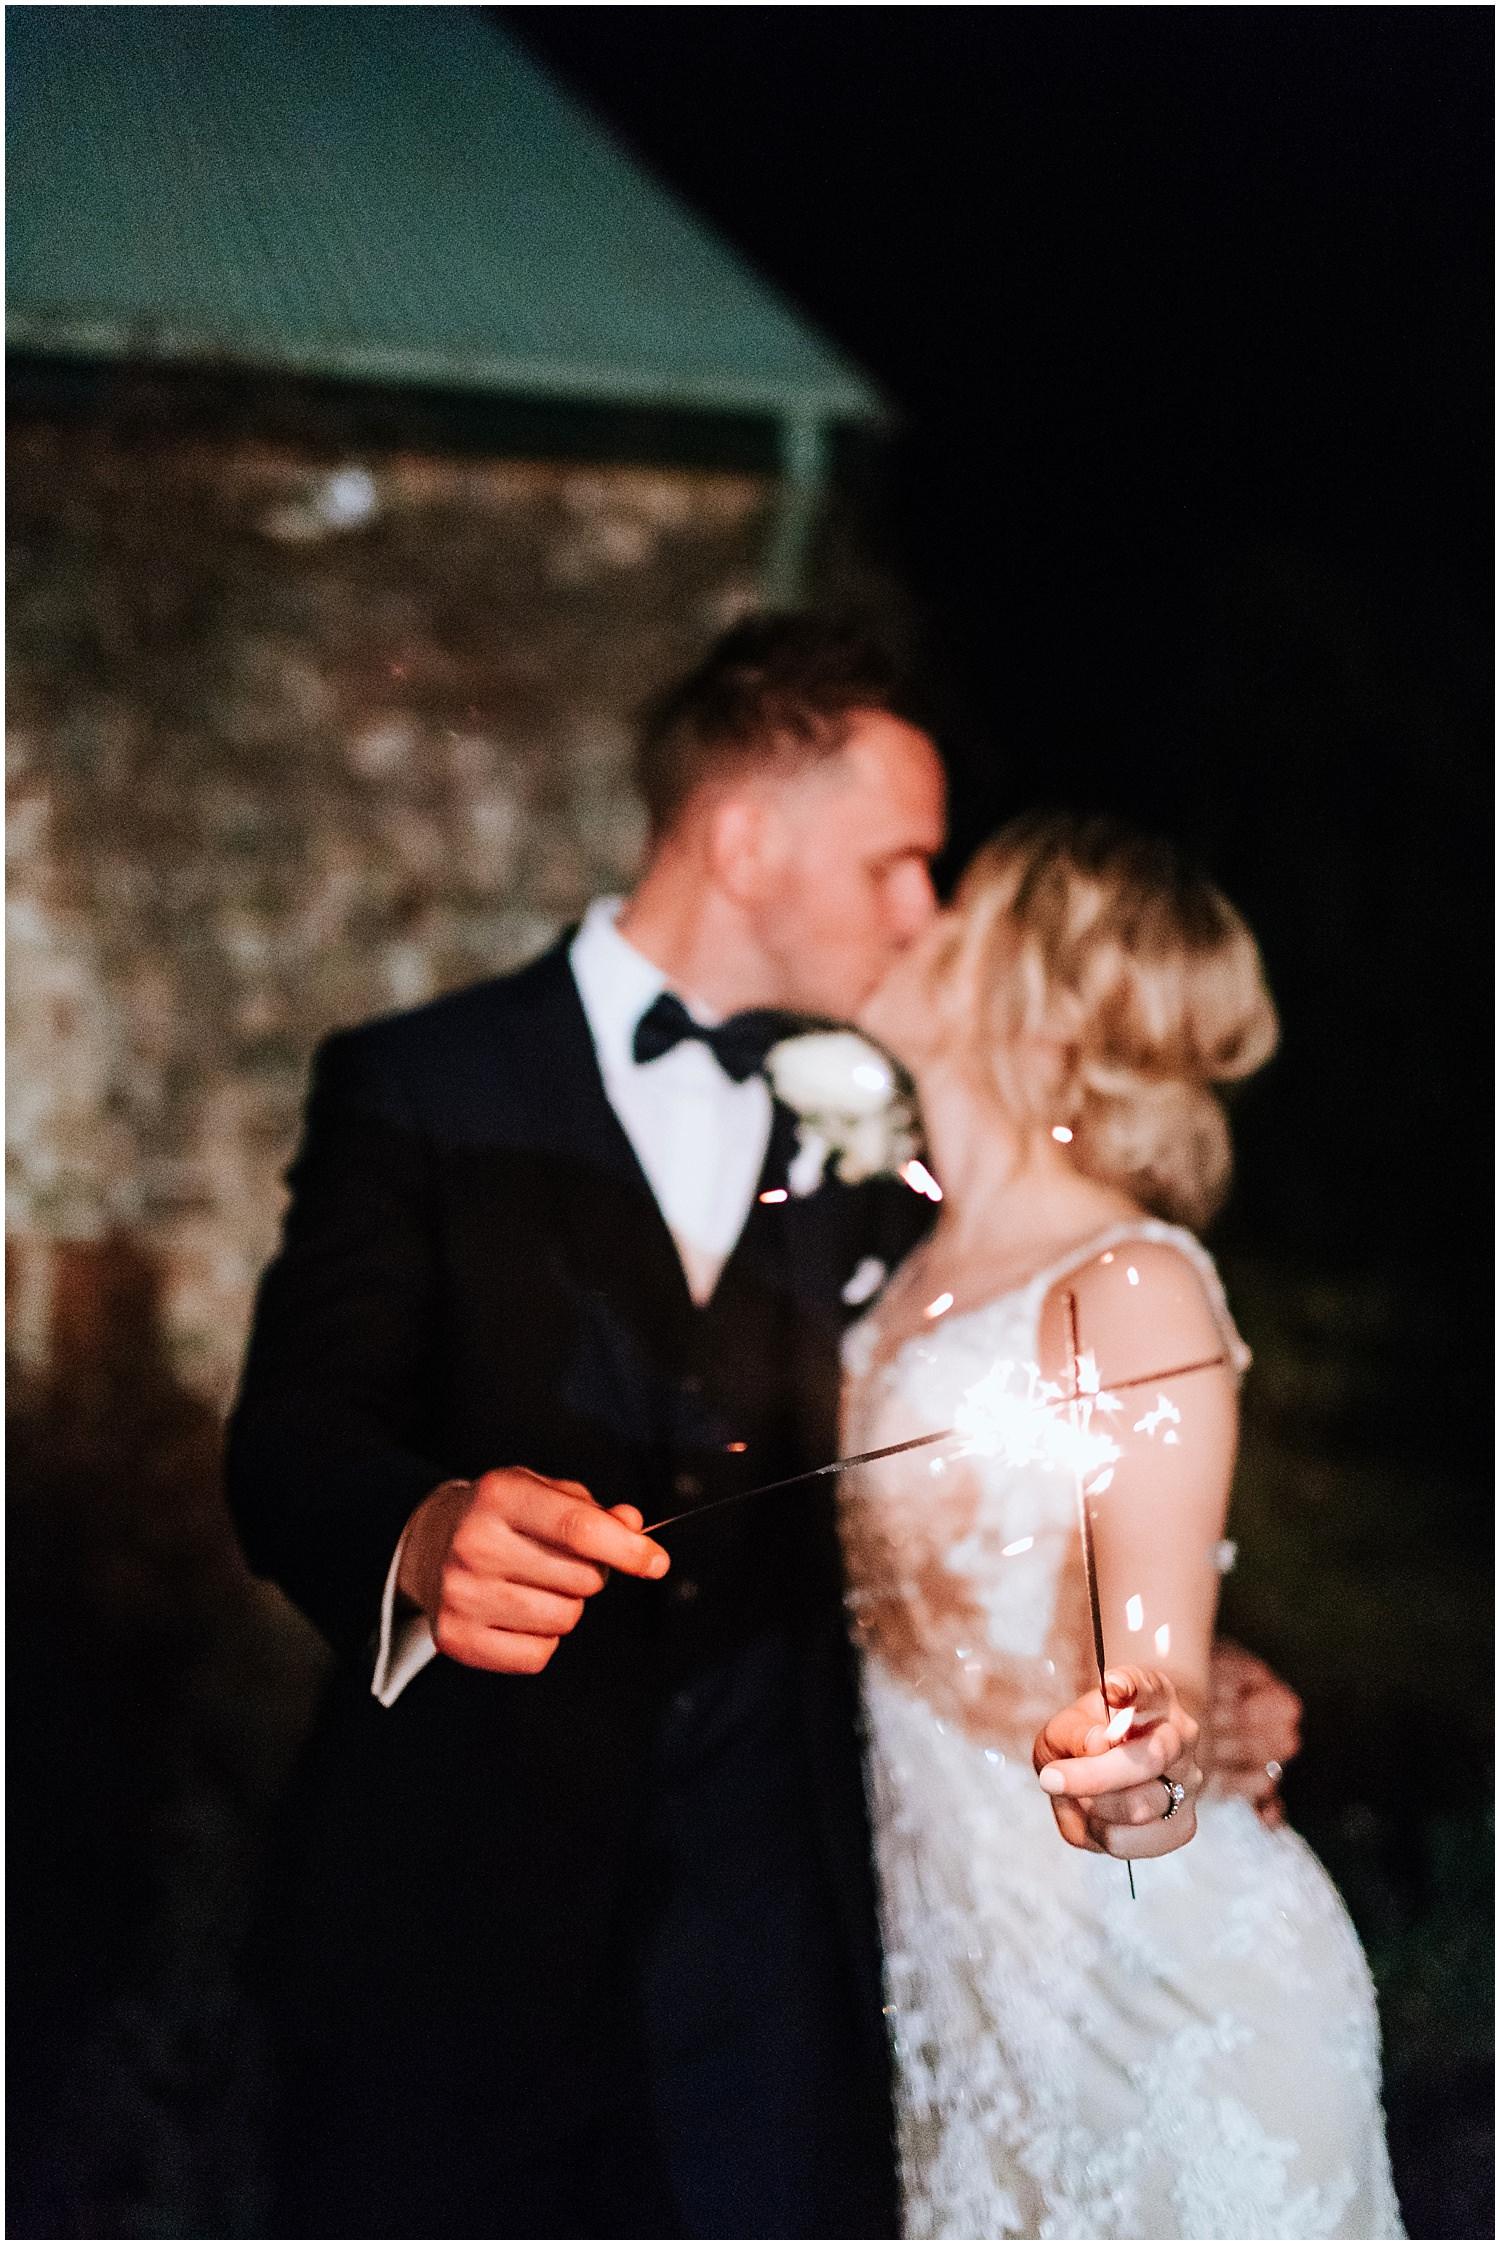 dominique-guy-montrose-berry-farm-wedding-_0103.jpg